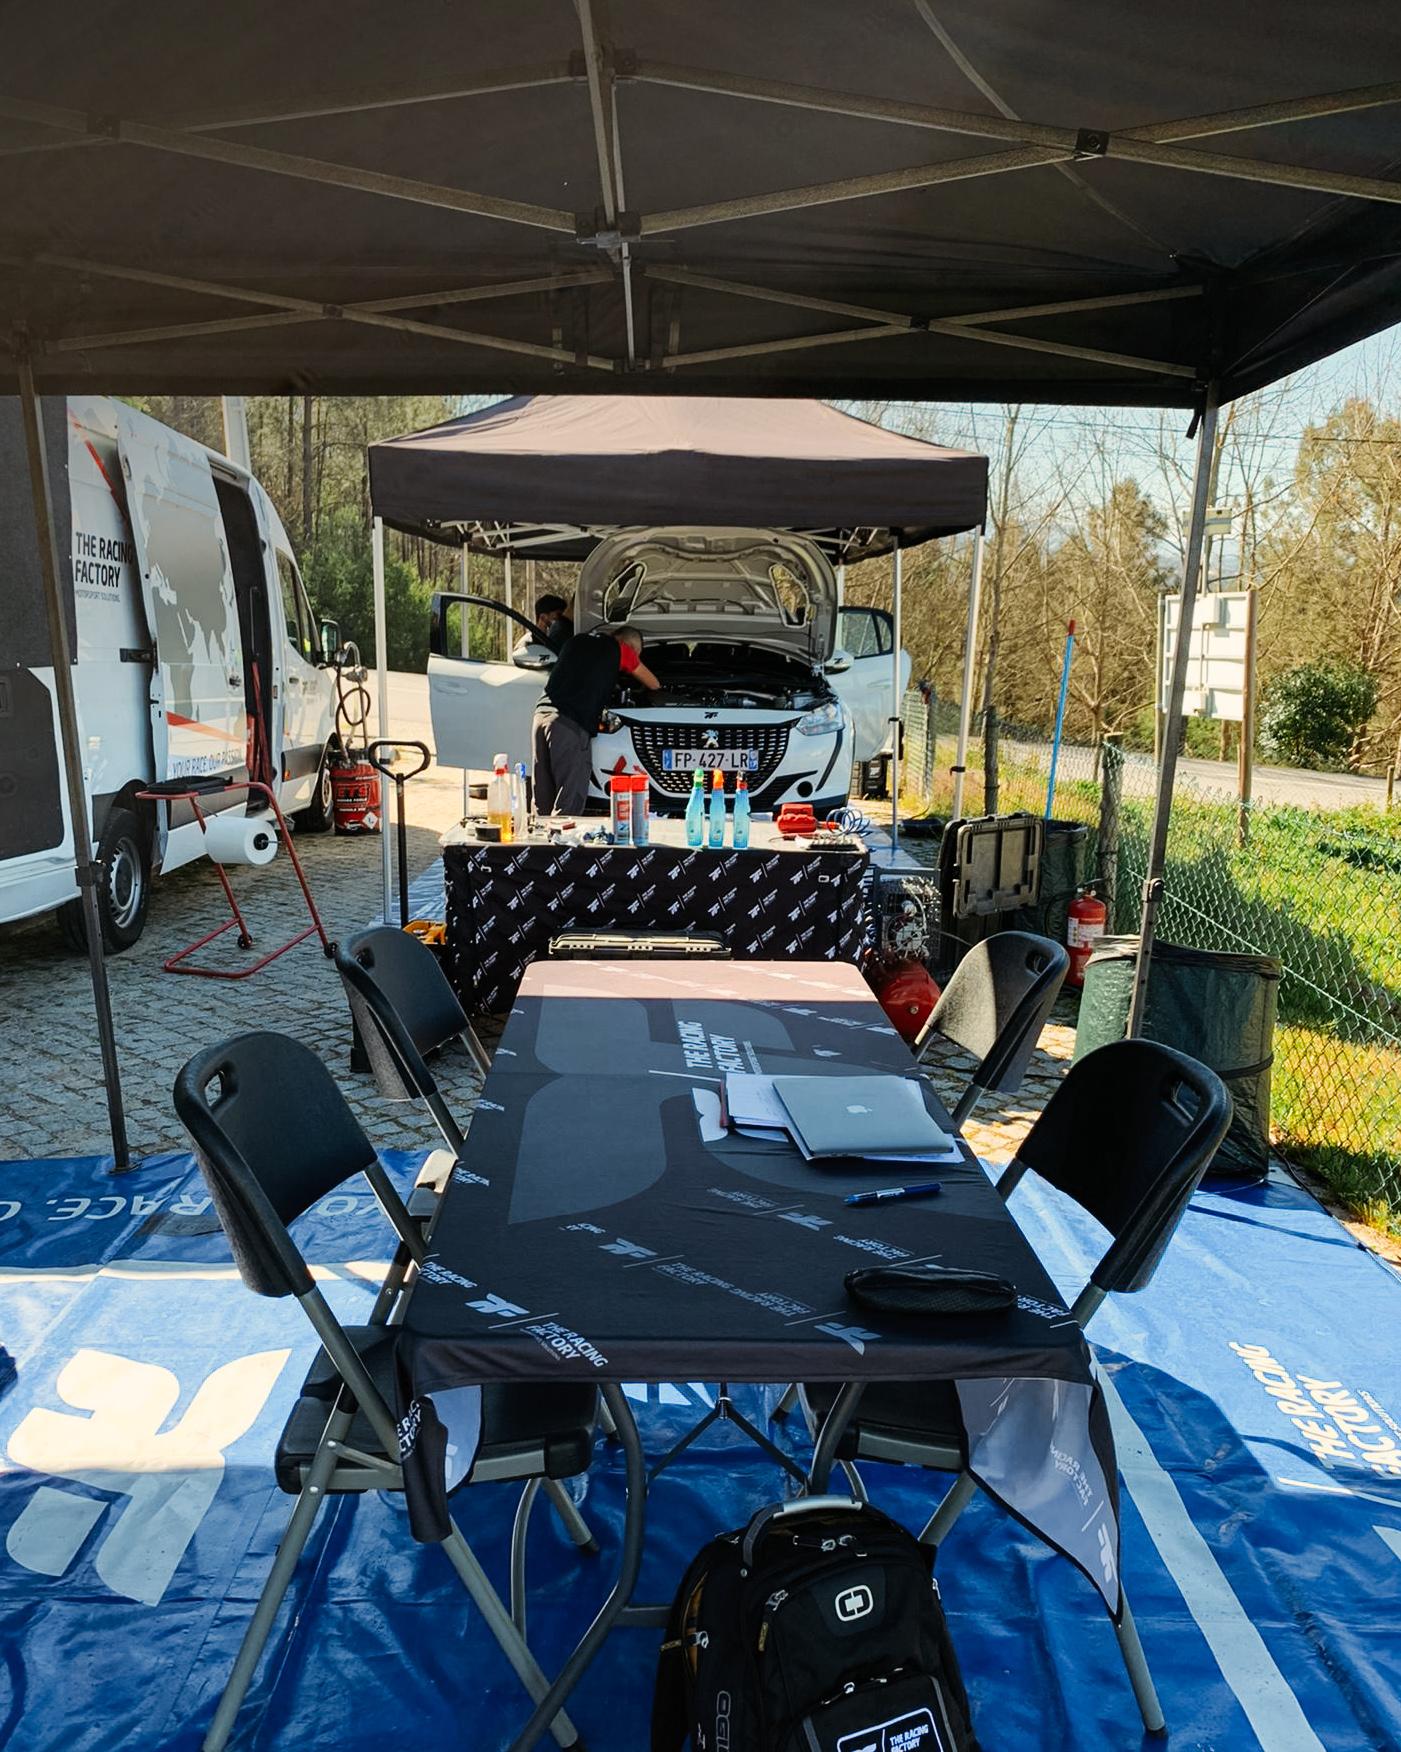 FIA European Rally Championship: Temporada 2021 - Página 4 ExL0WEwVcAUGexe?format=jpg&name=large